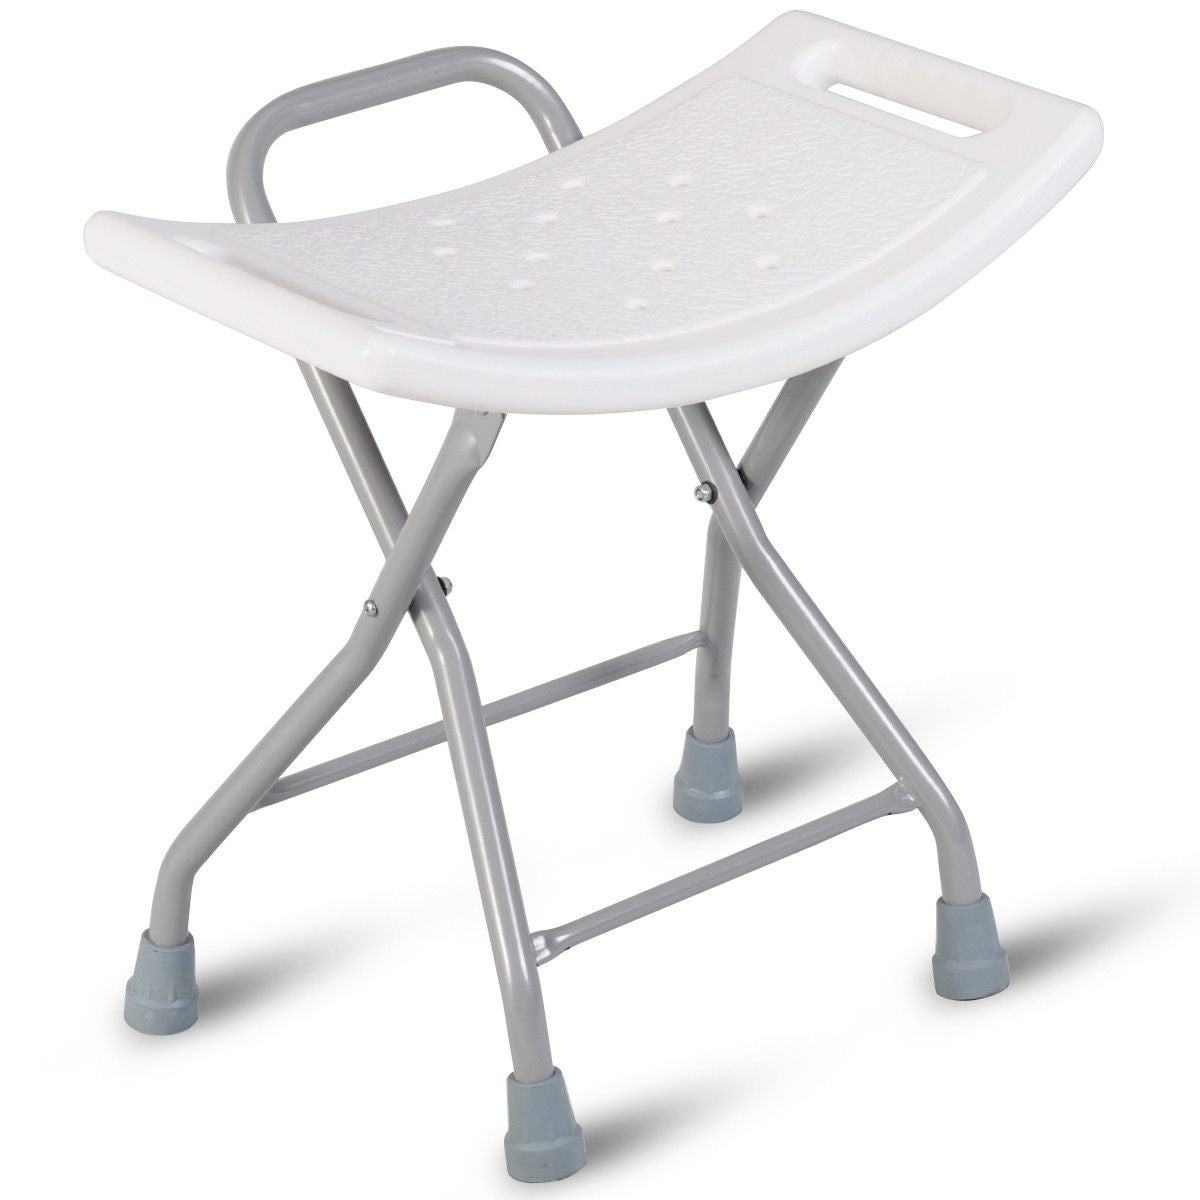 Buy Plastic Shower Stalls & Kits Online at Overstock.com | Our Best ...